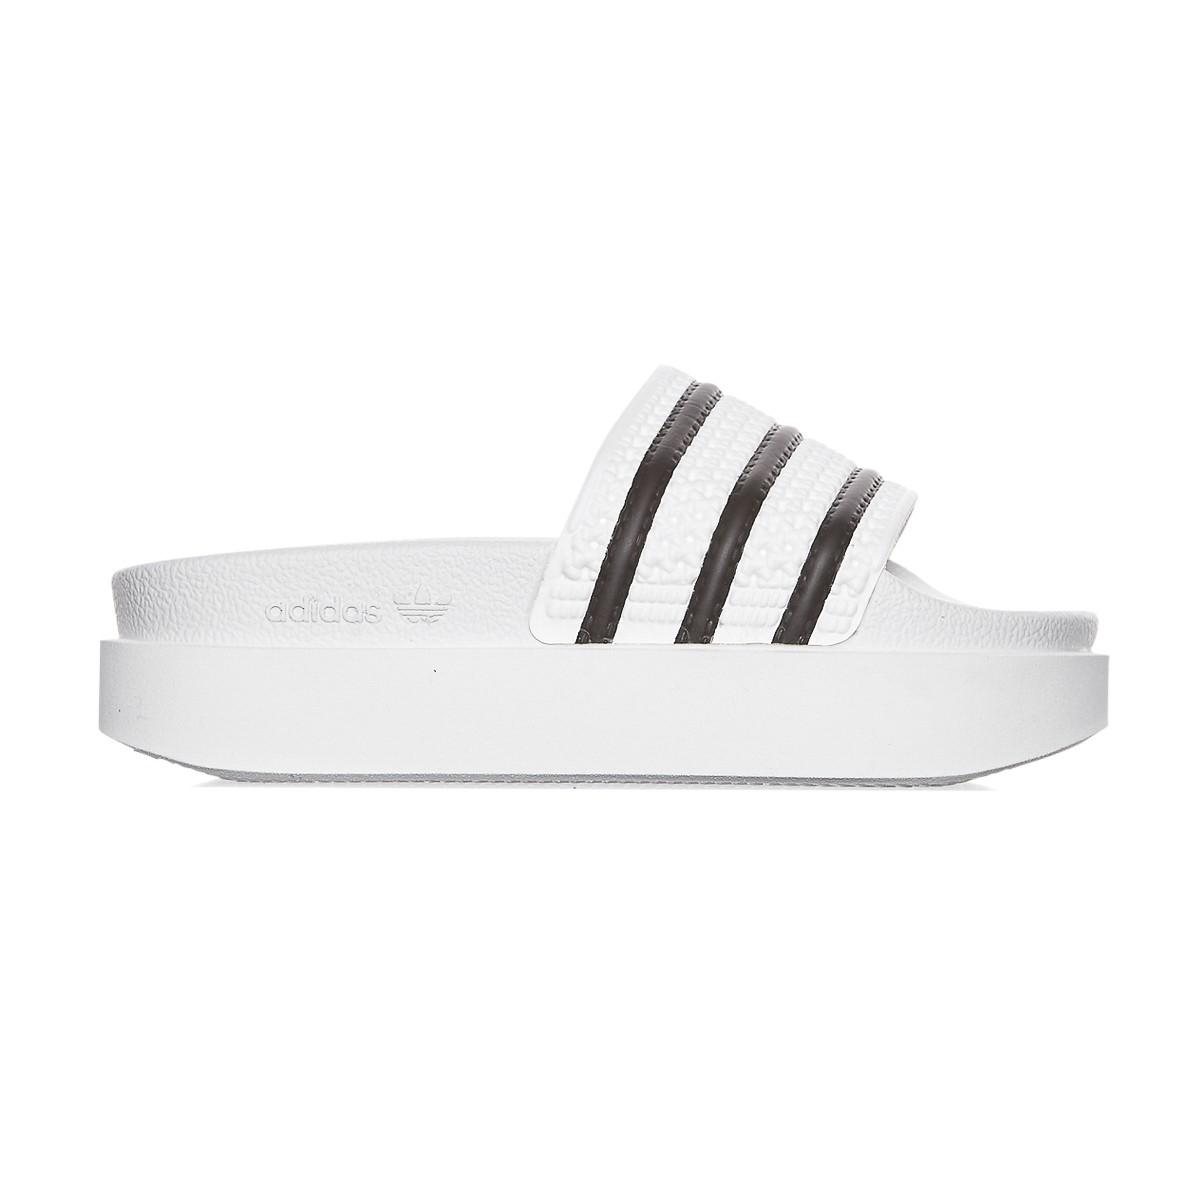 7f7f495c78adde Lyst - adidas Originals Adilette Bold Slide Sandals in Black